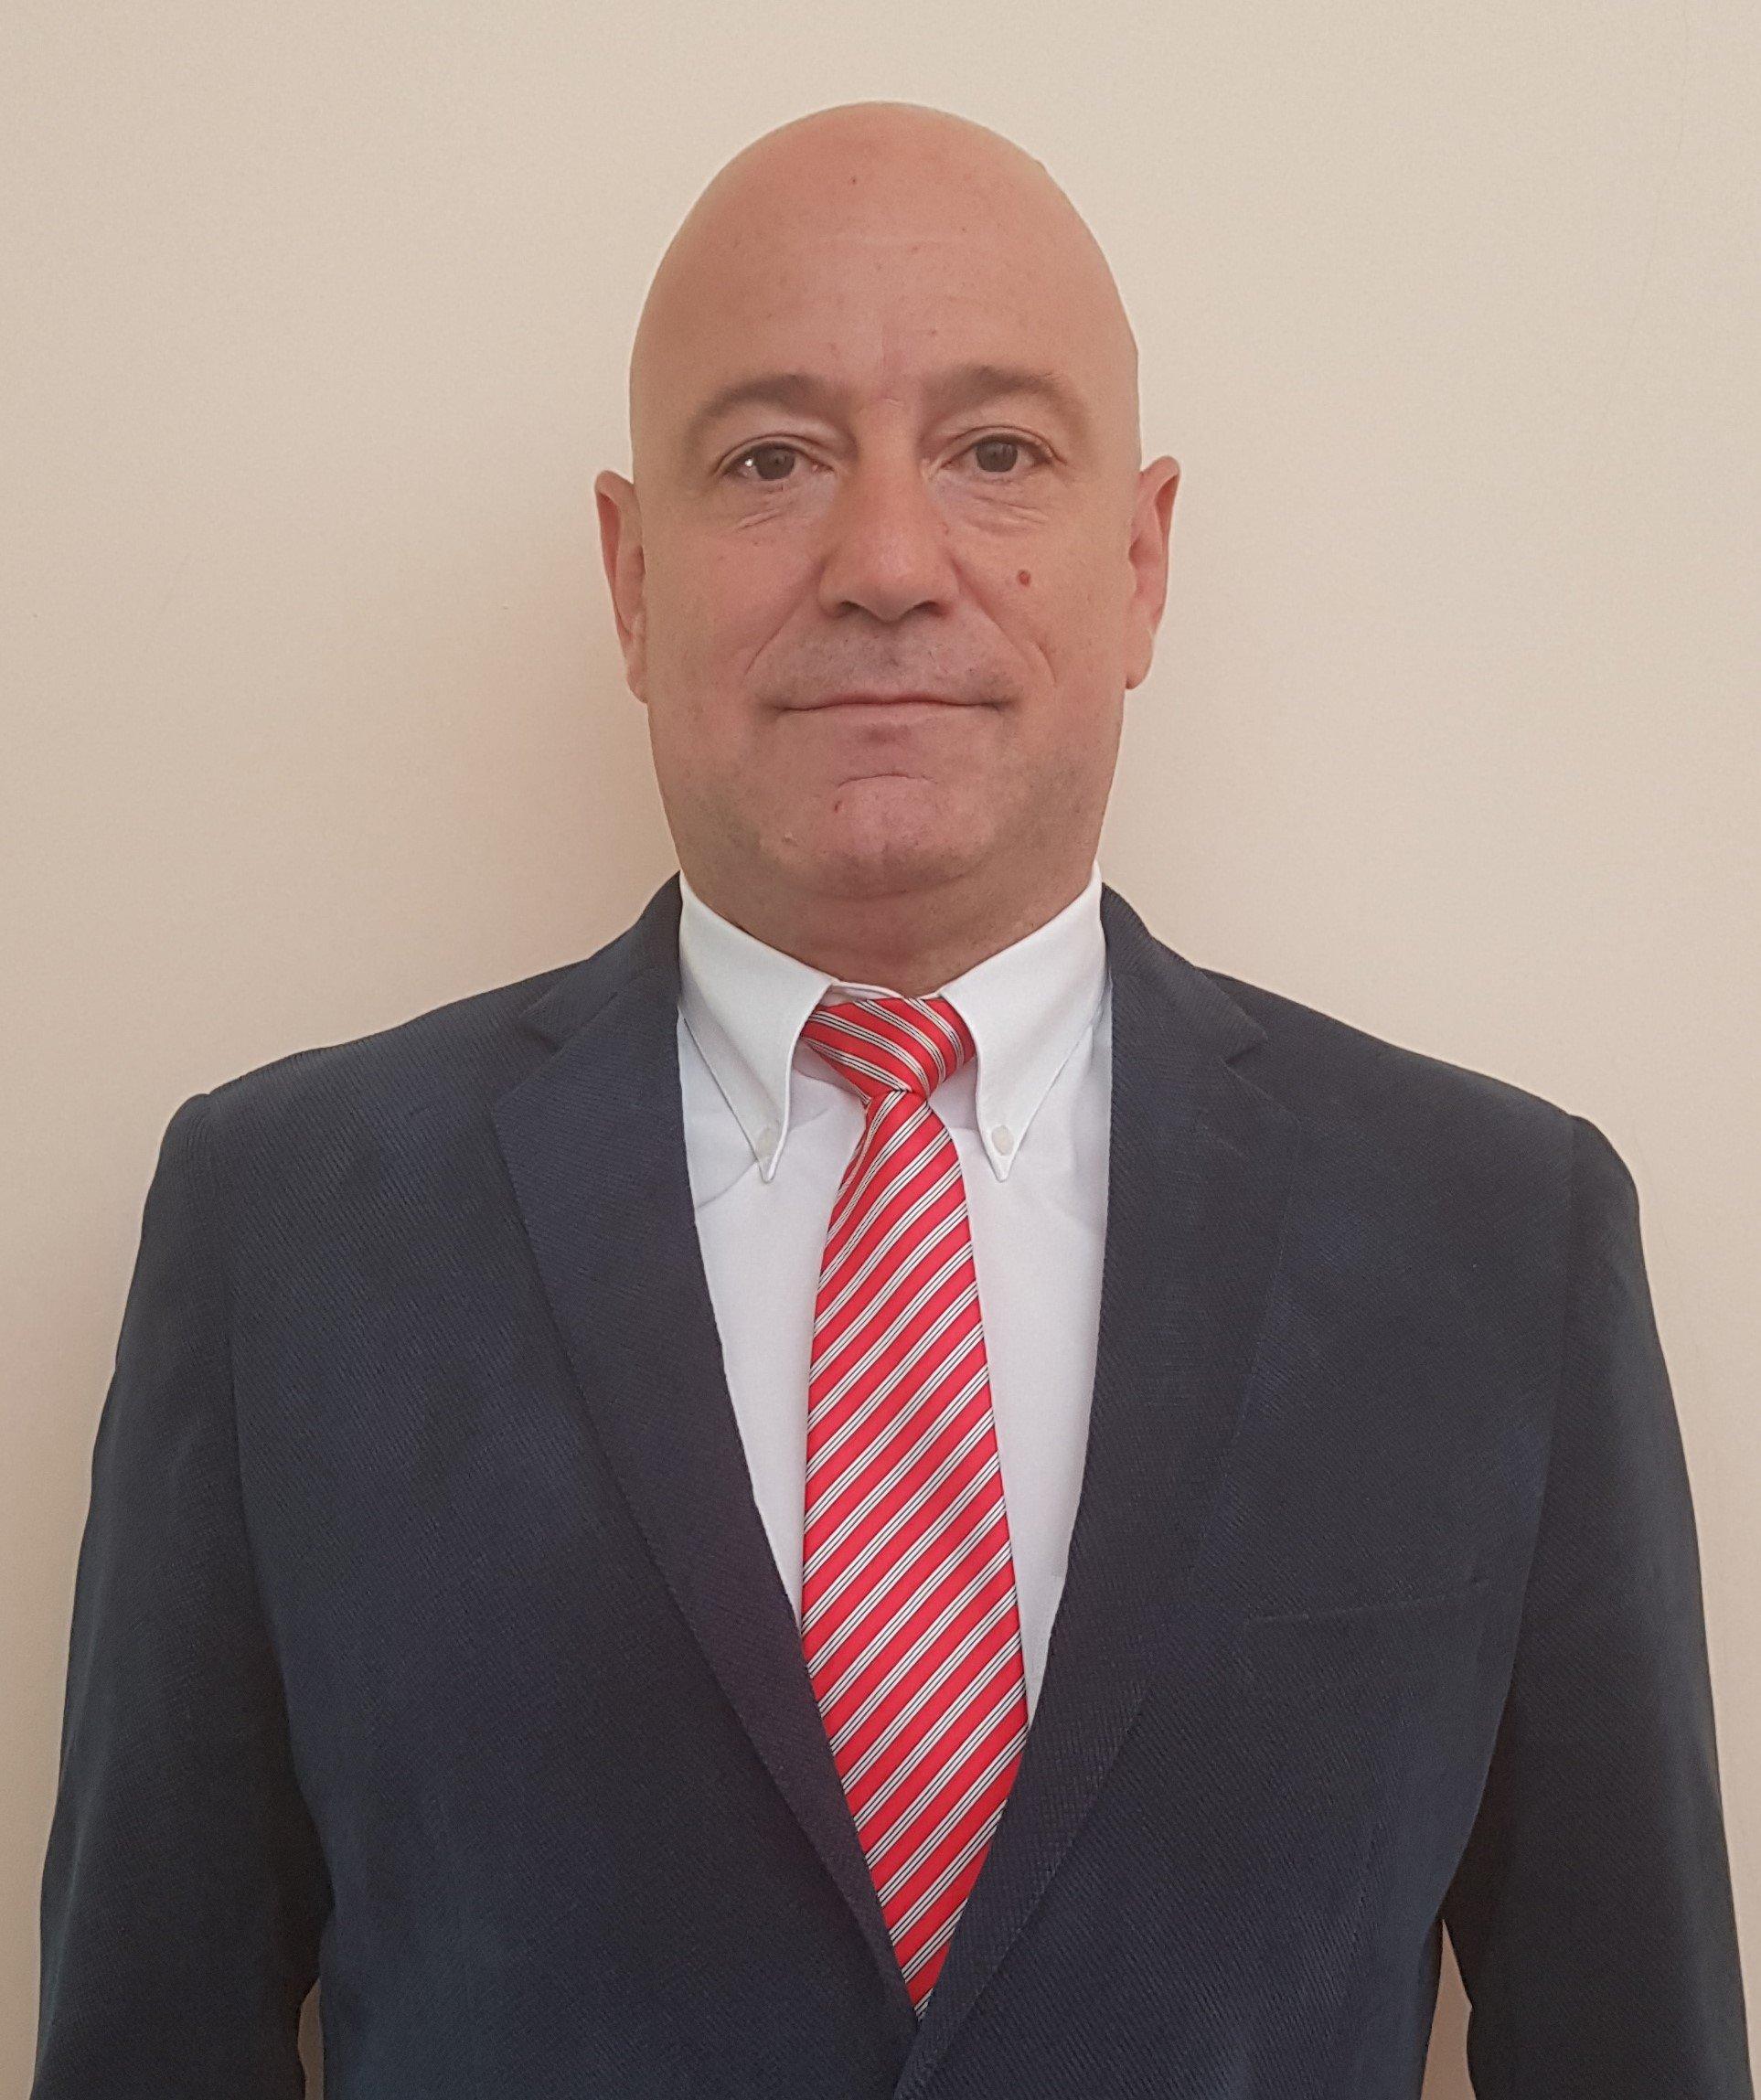 Mr. Raul Camacho Perez